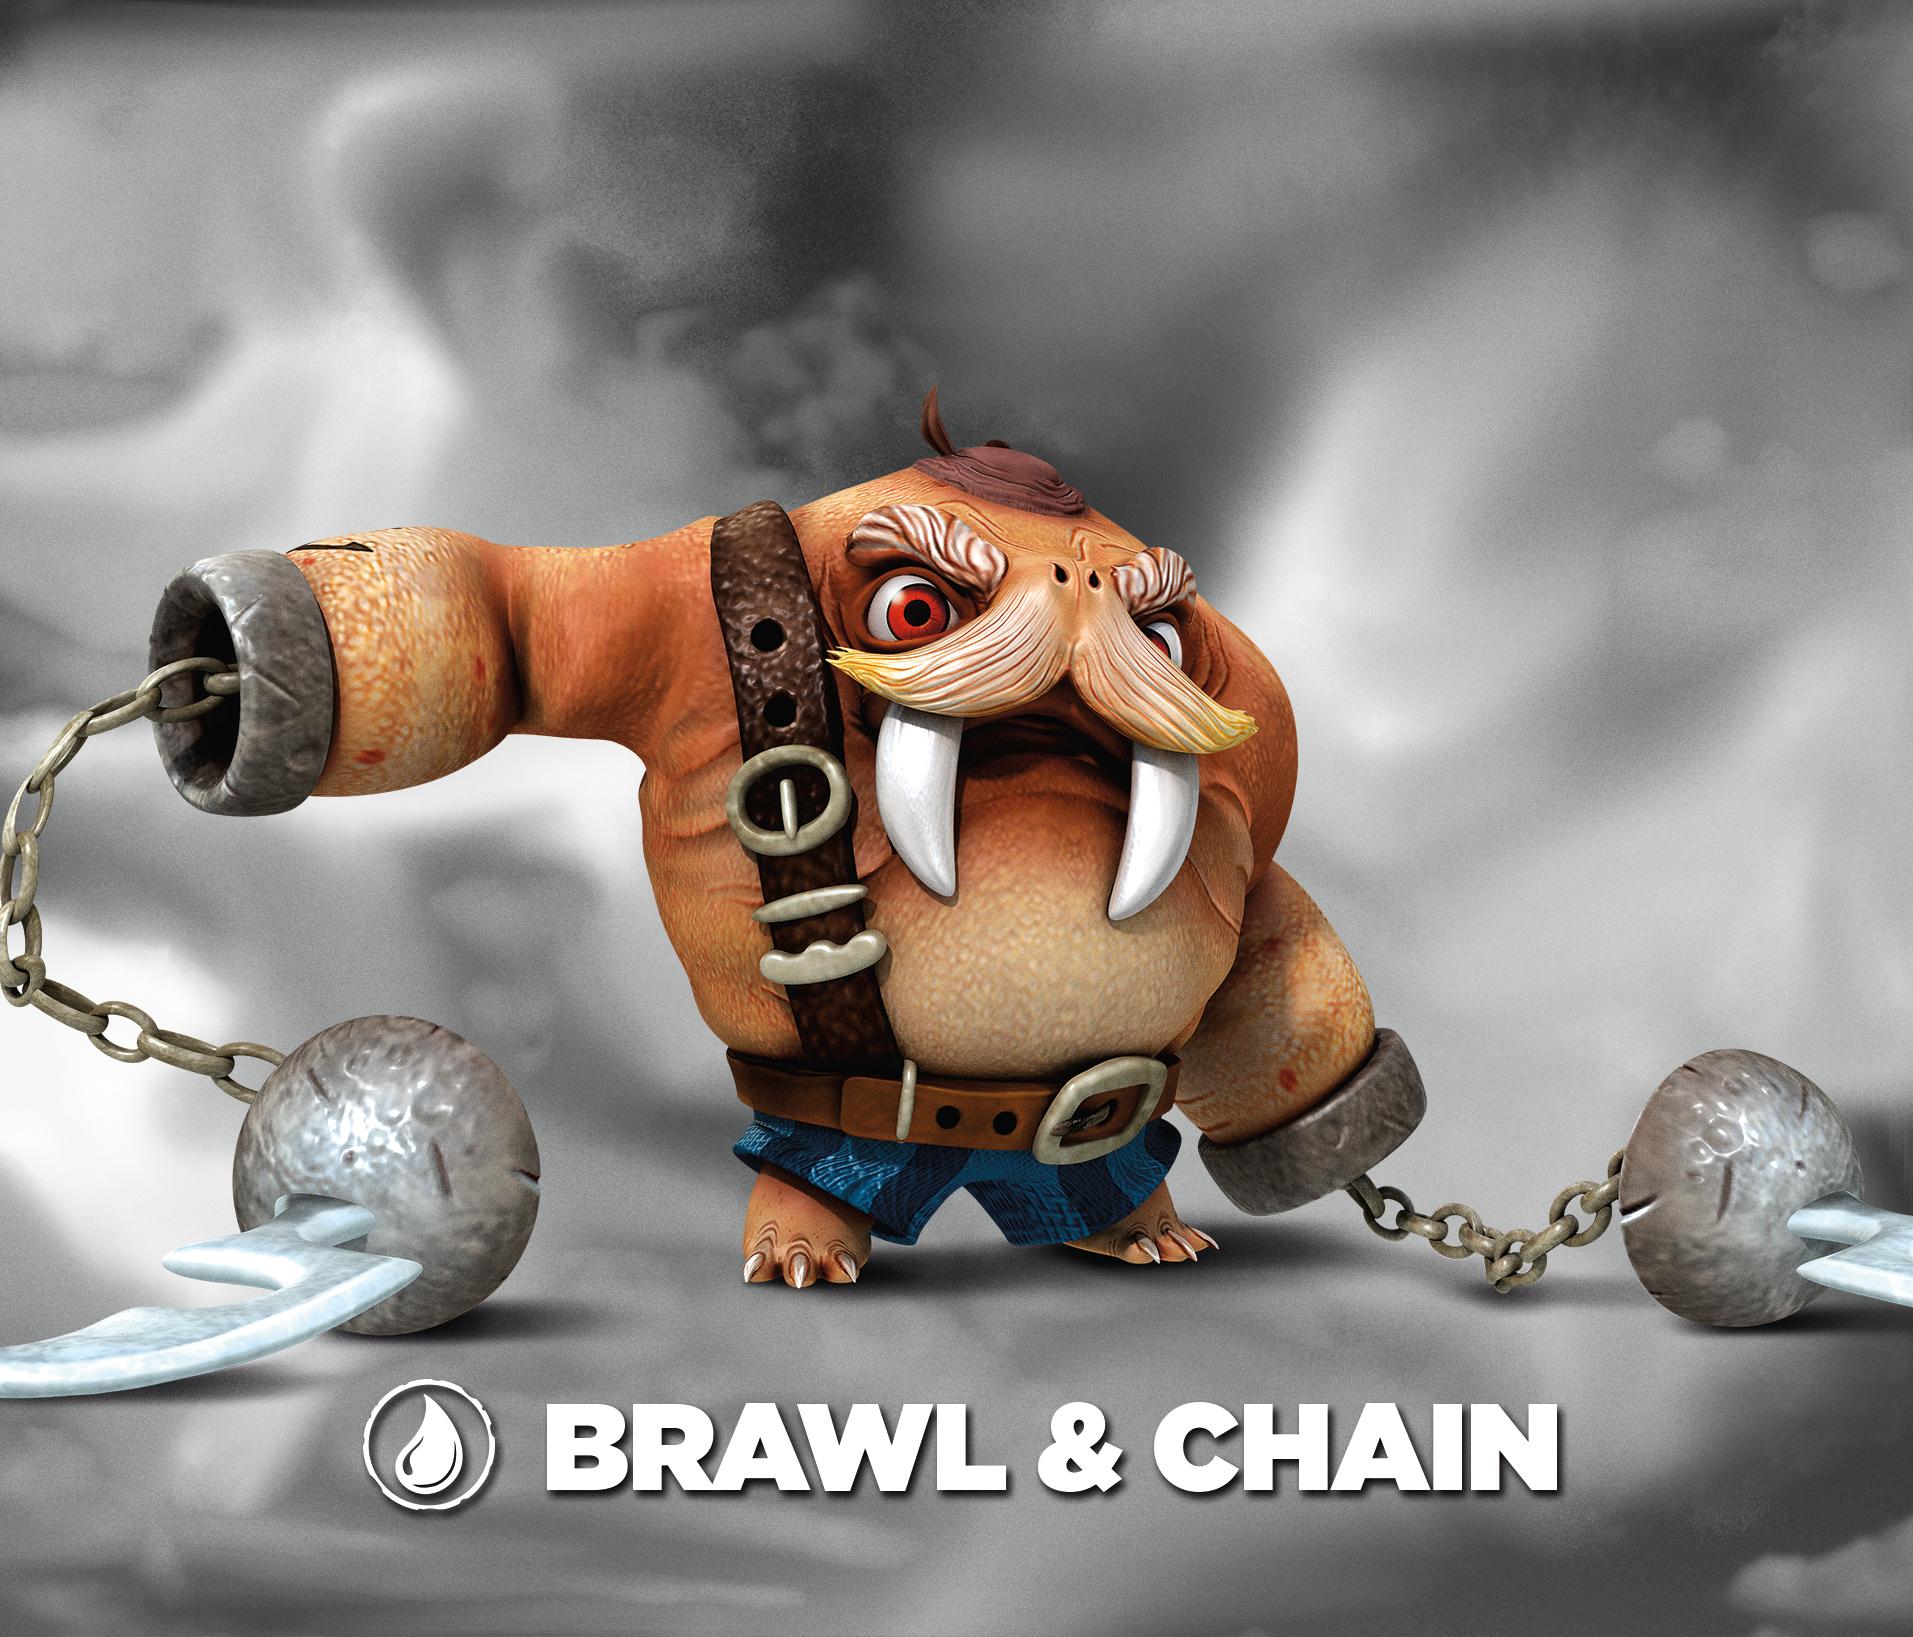 brawl chain villain skylanders wiki fandom powered